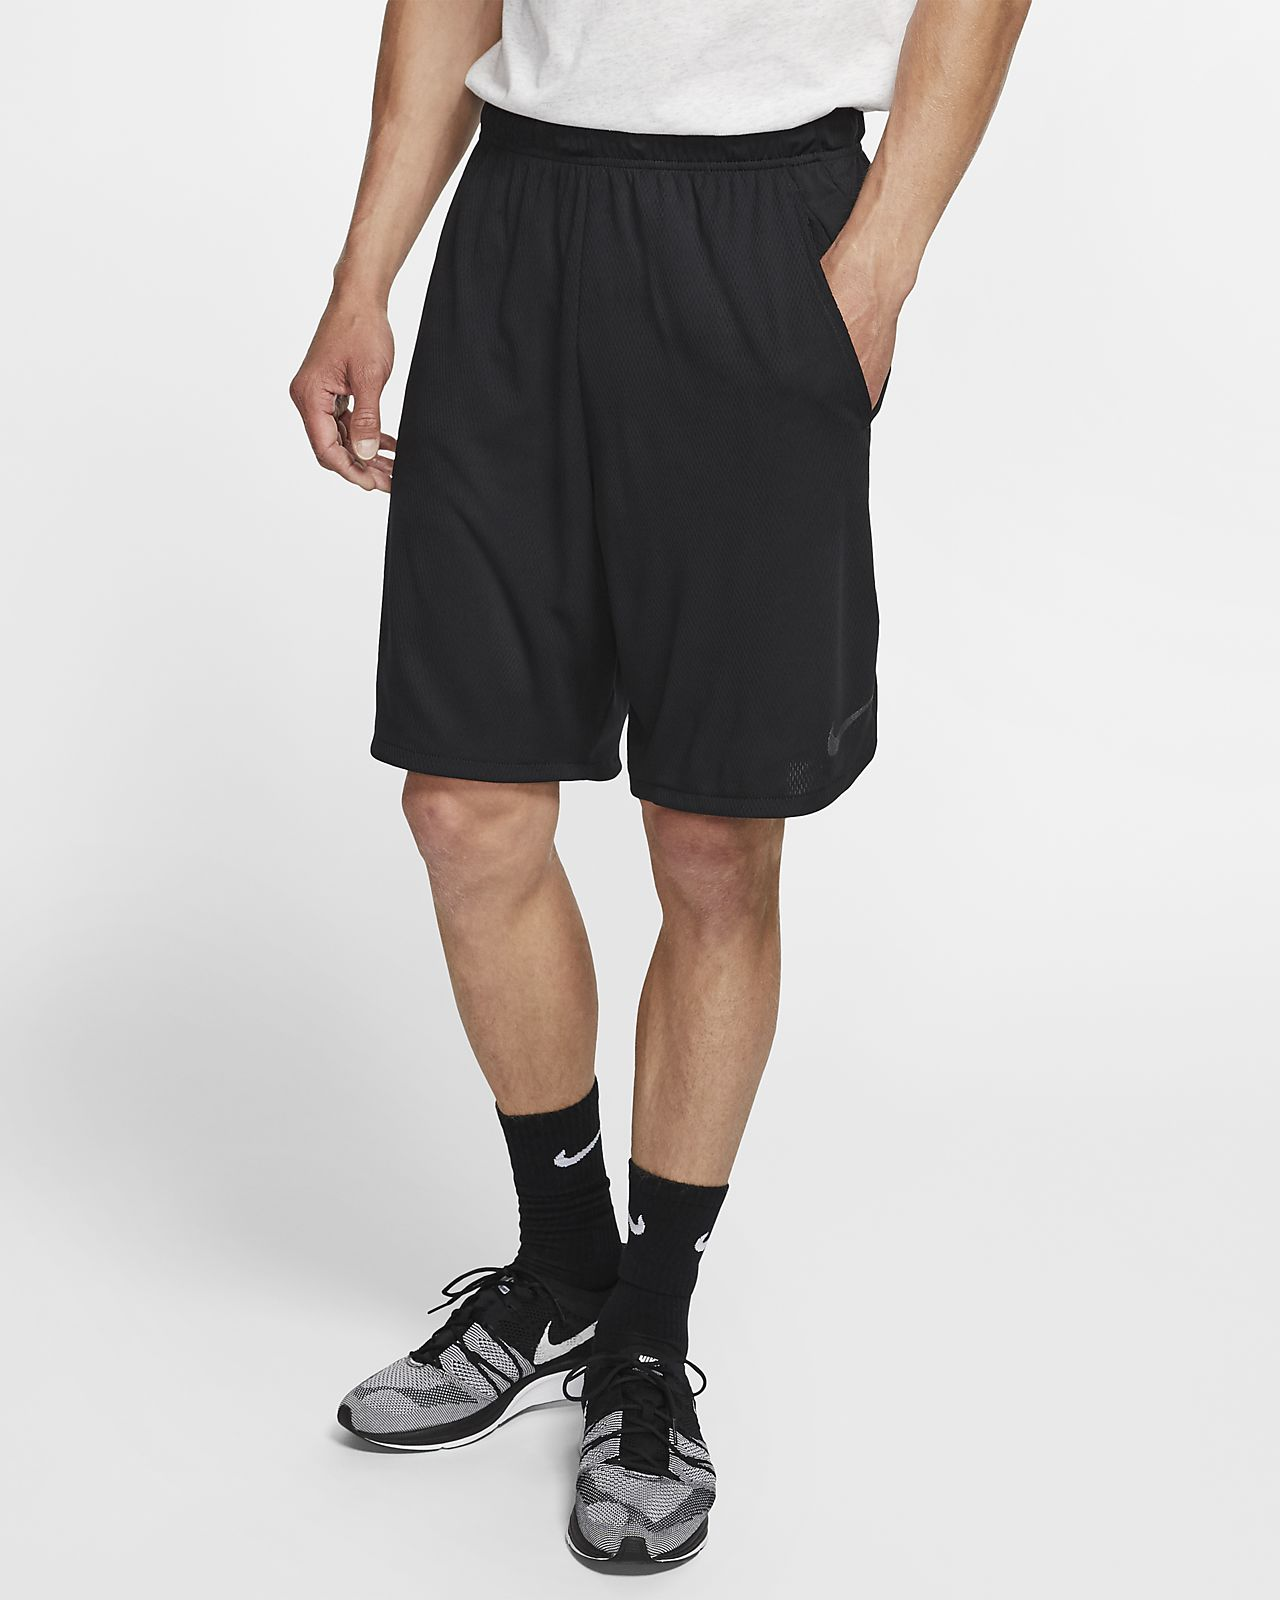 Nike Mens Training Shorts - Nike Dri-FIT Fleece Deep Royal Blue/Black D32s3616